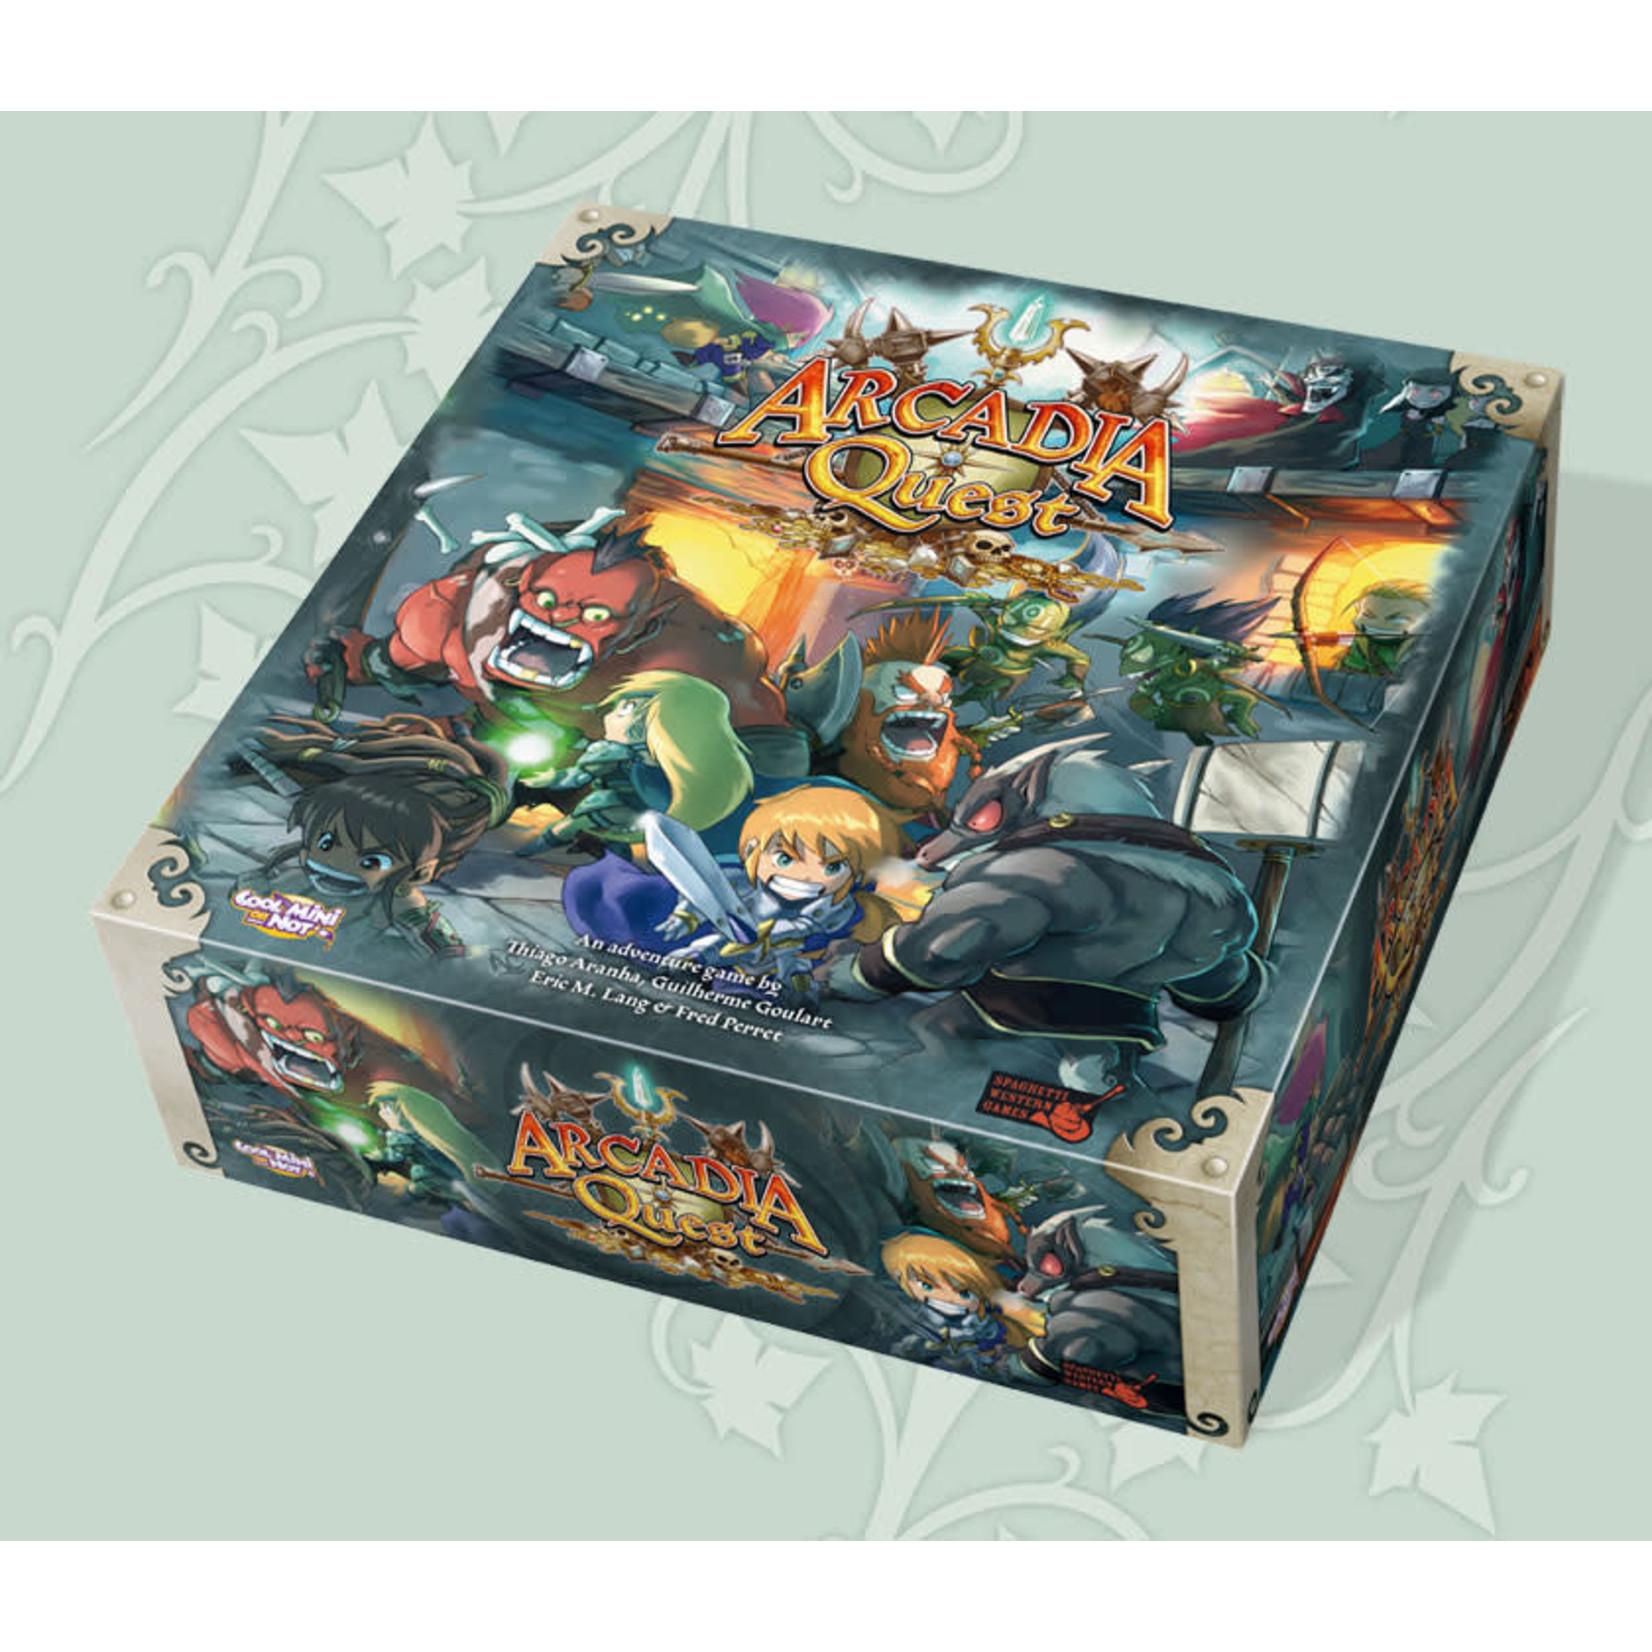 CMON Arcadia Quest Core Box